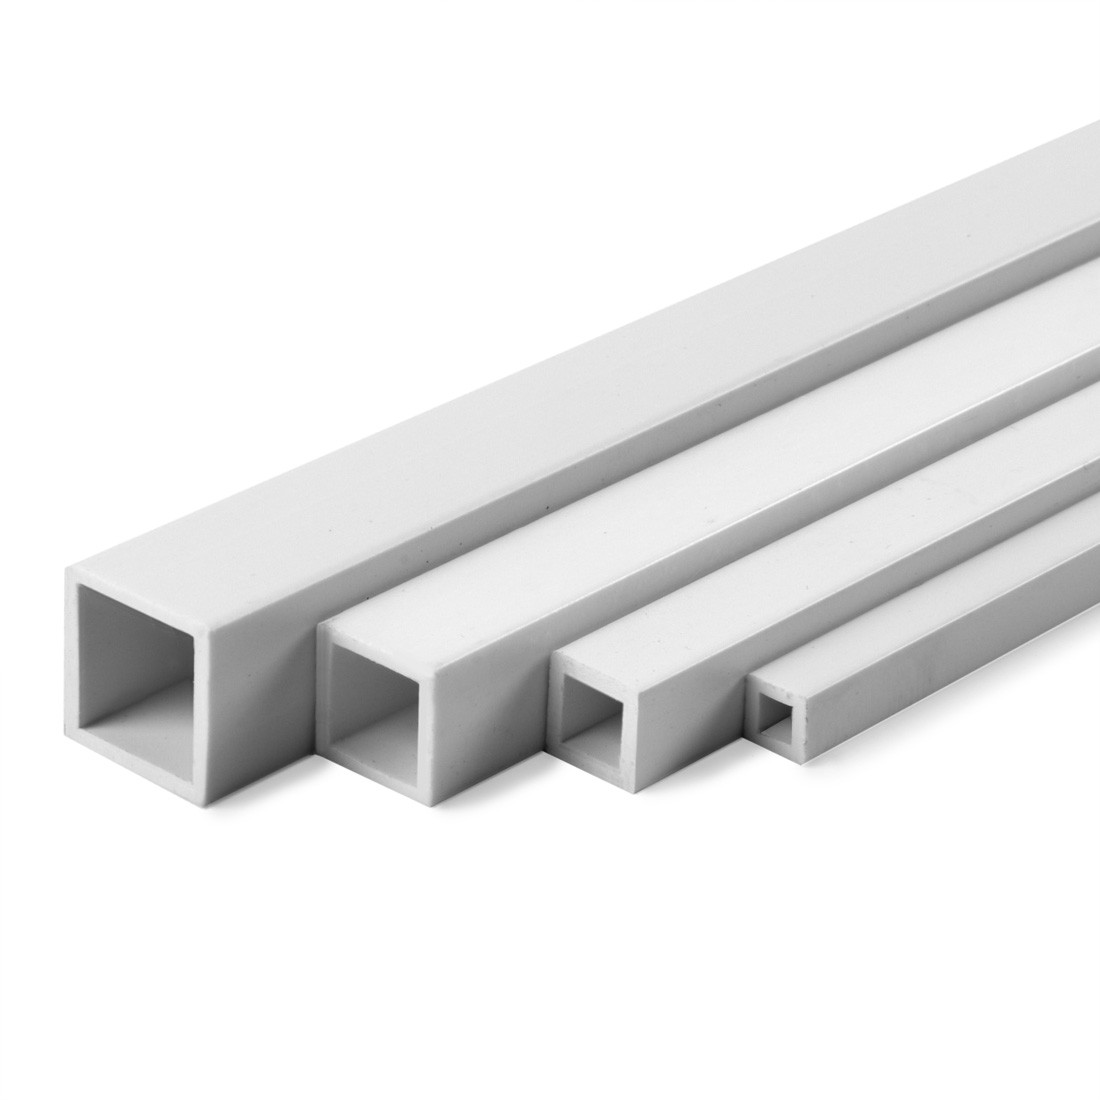 ASA square tube profile mm.8x10x1000